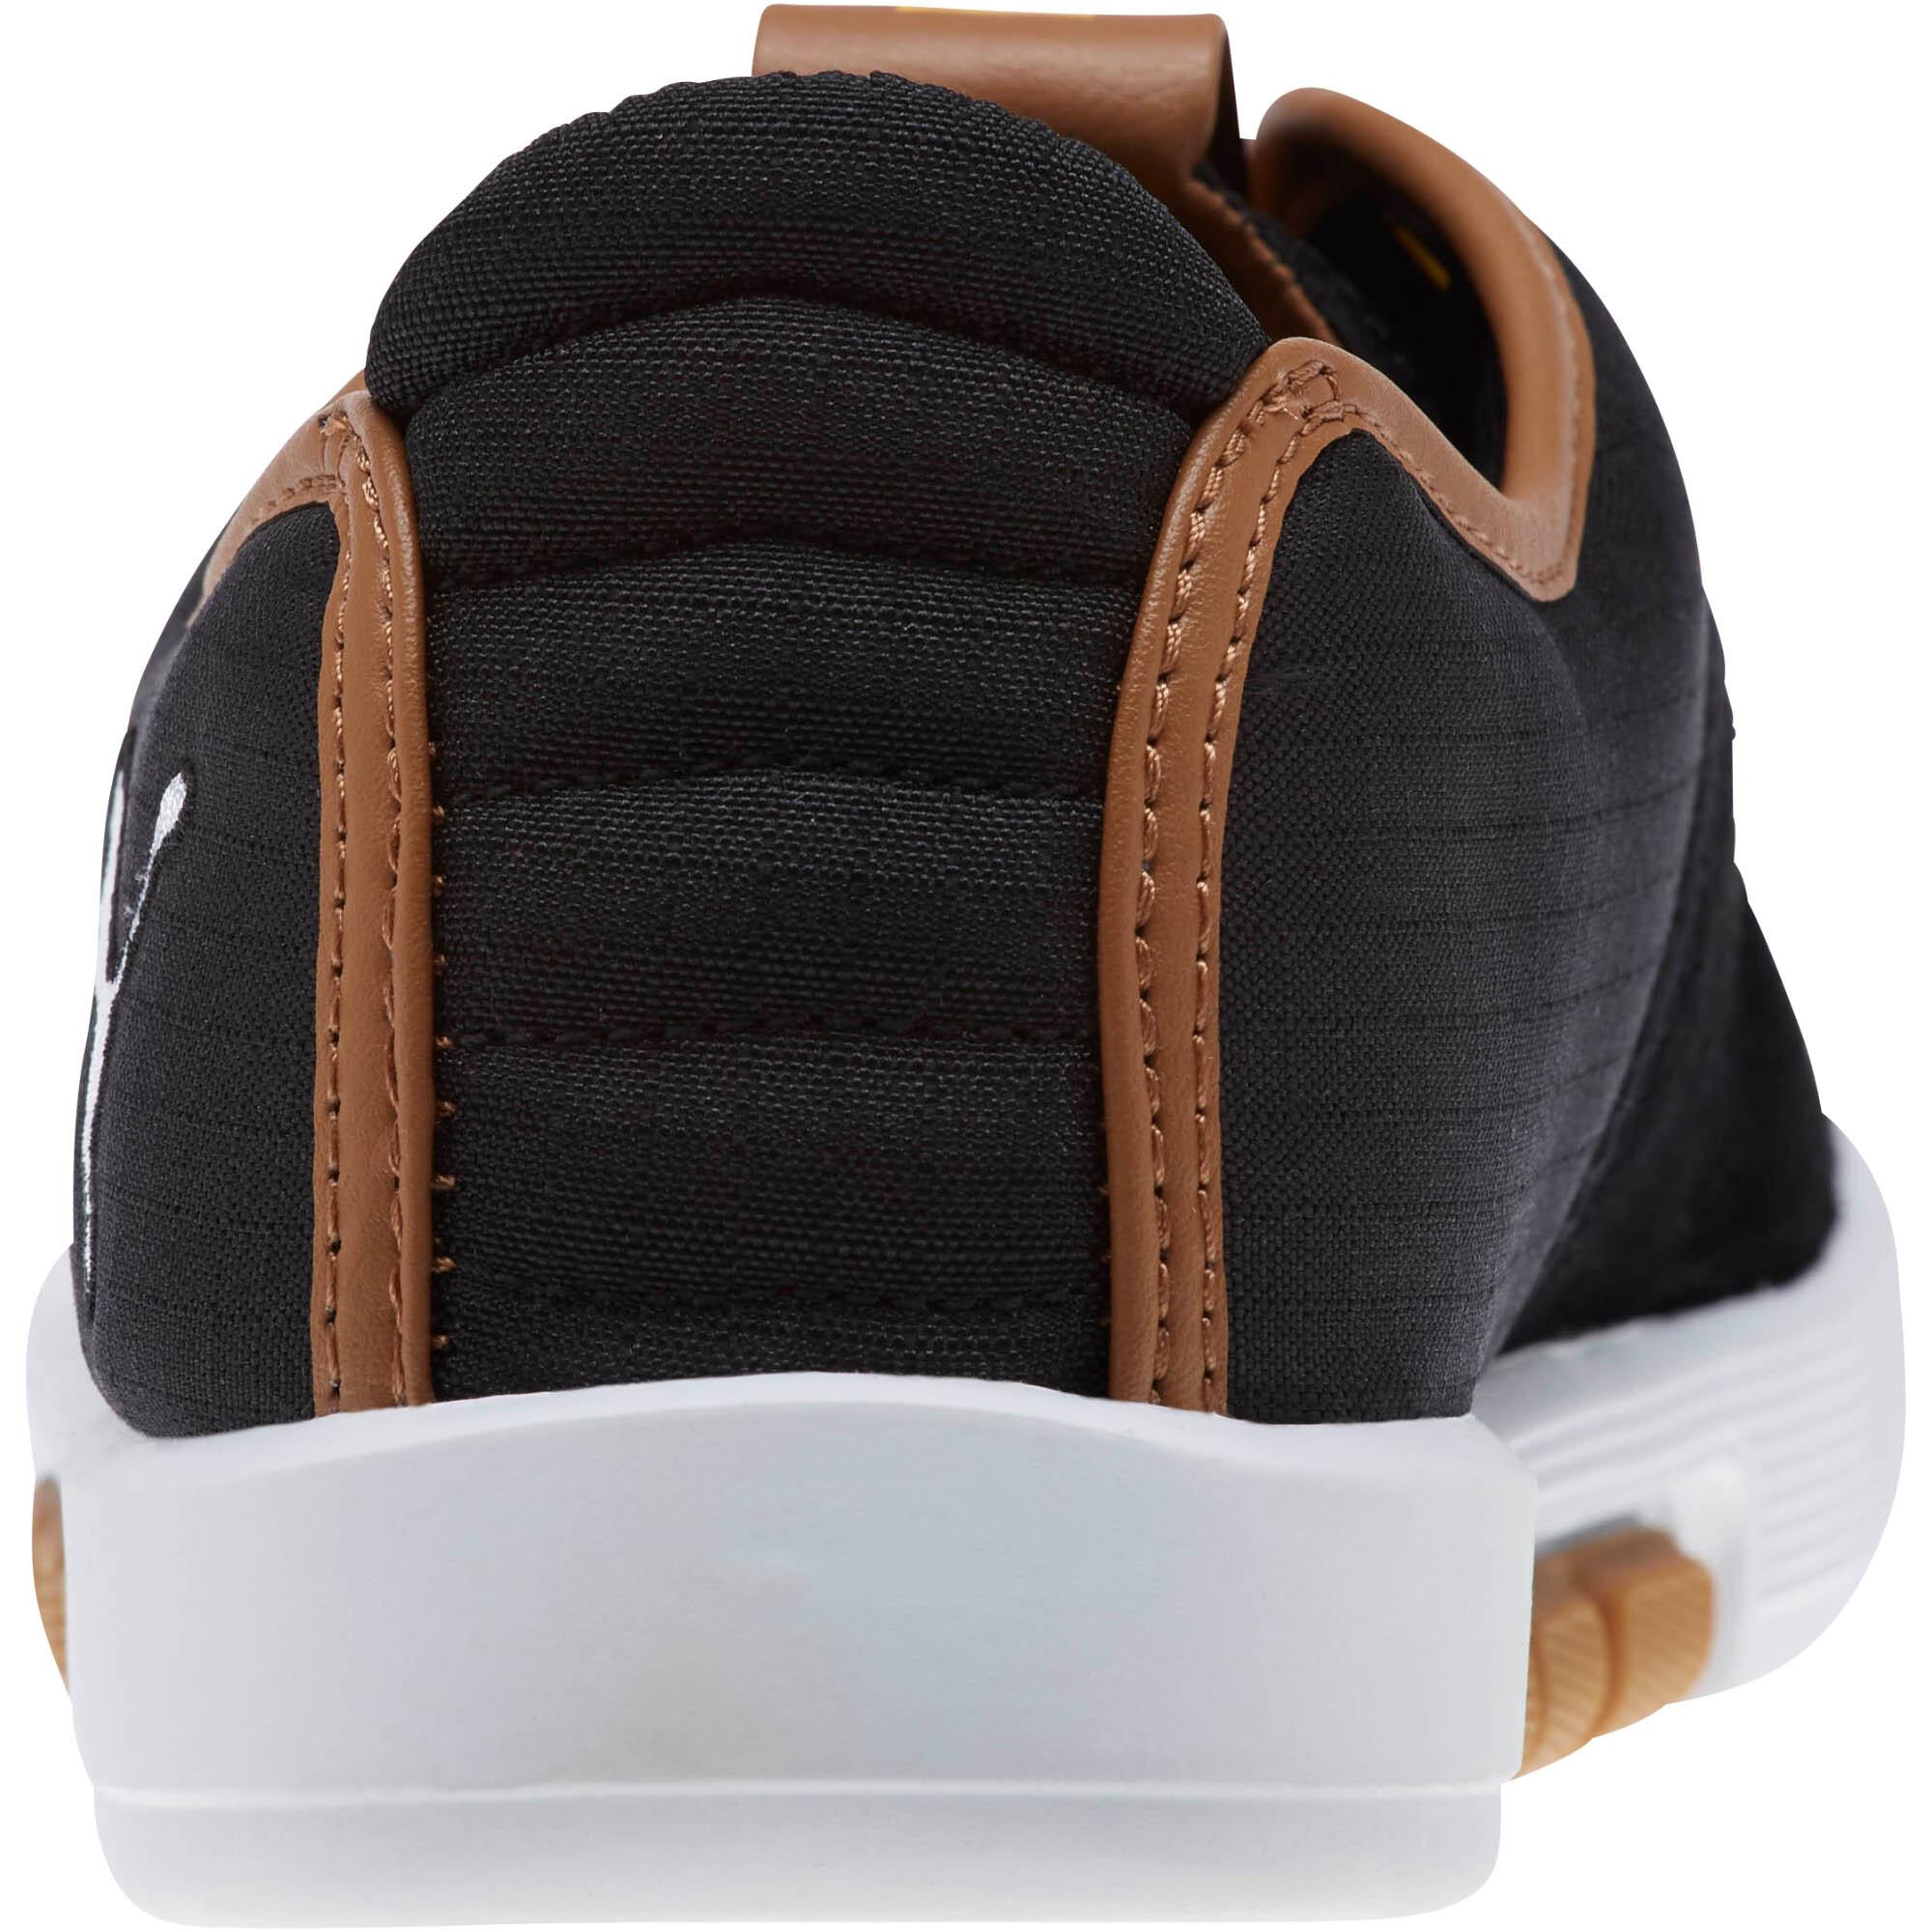 PUMA-Funist-Lo-MU-Men-039-s-Sneakers-Men-Shoe-Evolution thumbnail 3